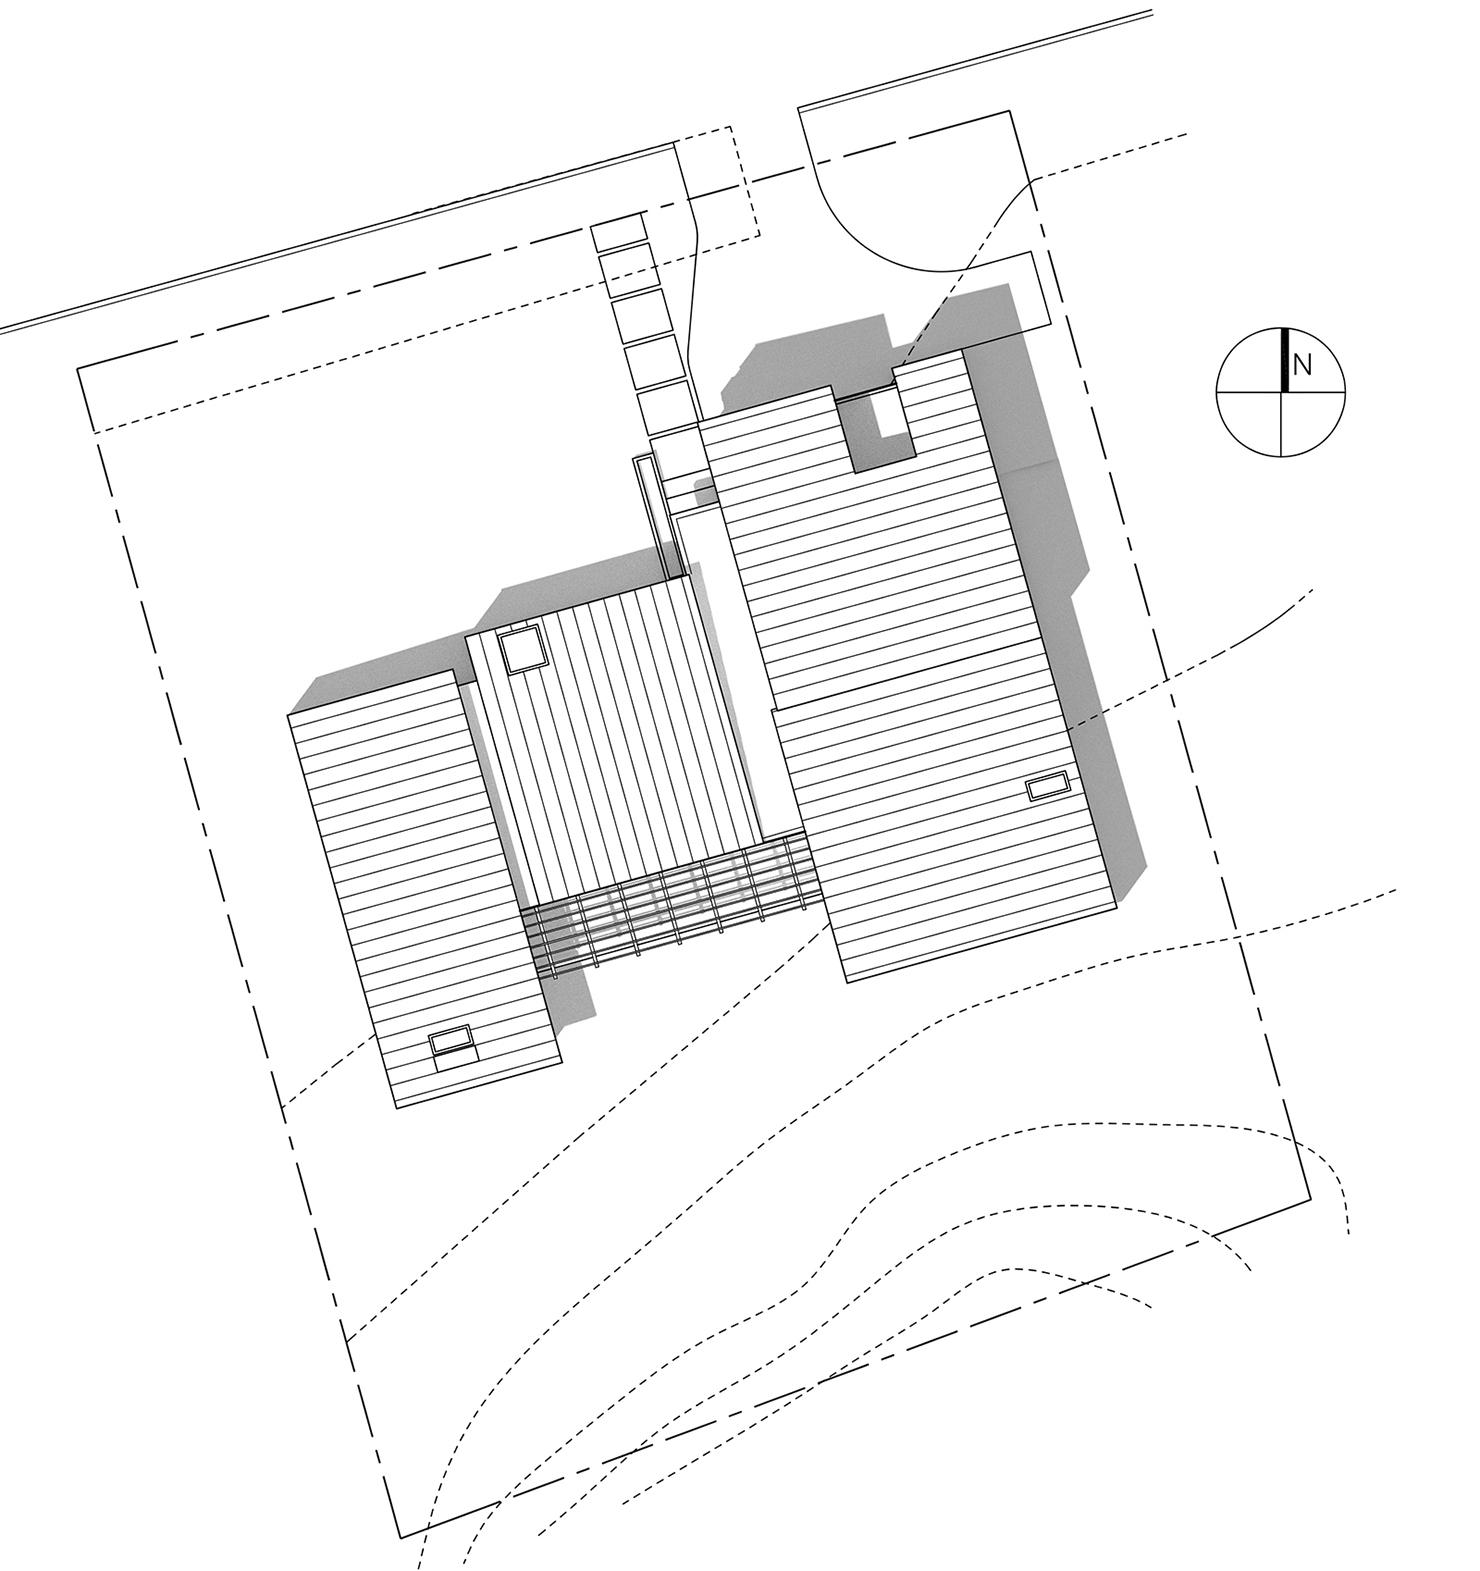 C:UsersJohnDesktopWork_Lightfoot Architecture & designTimberline South View Lots3DFinal RenderingsPresentation Drawing